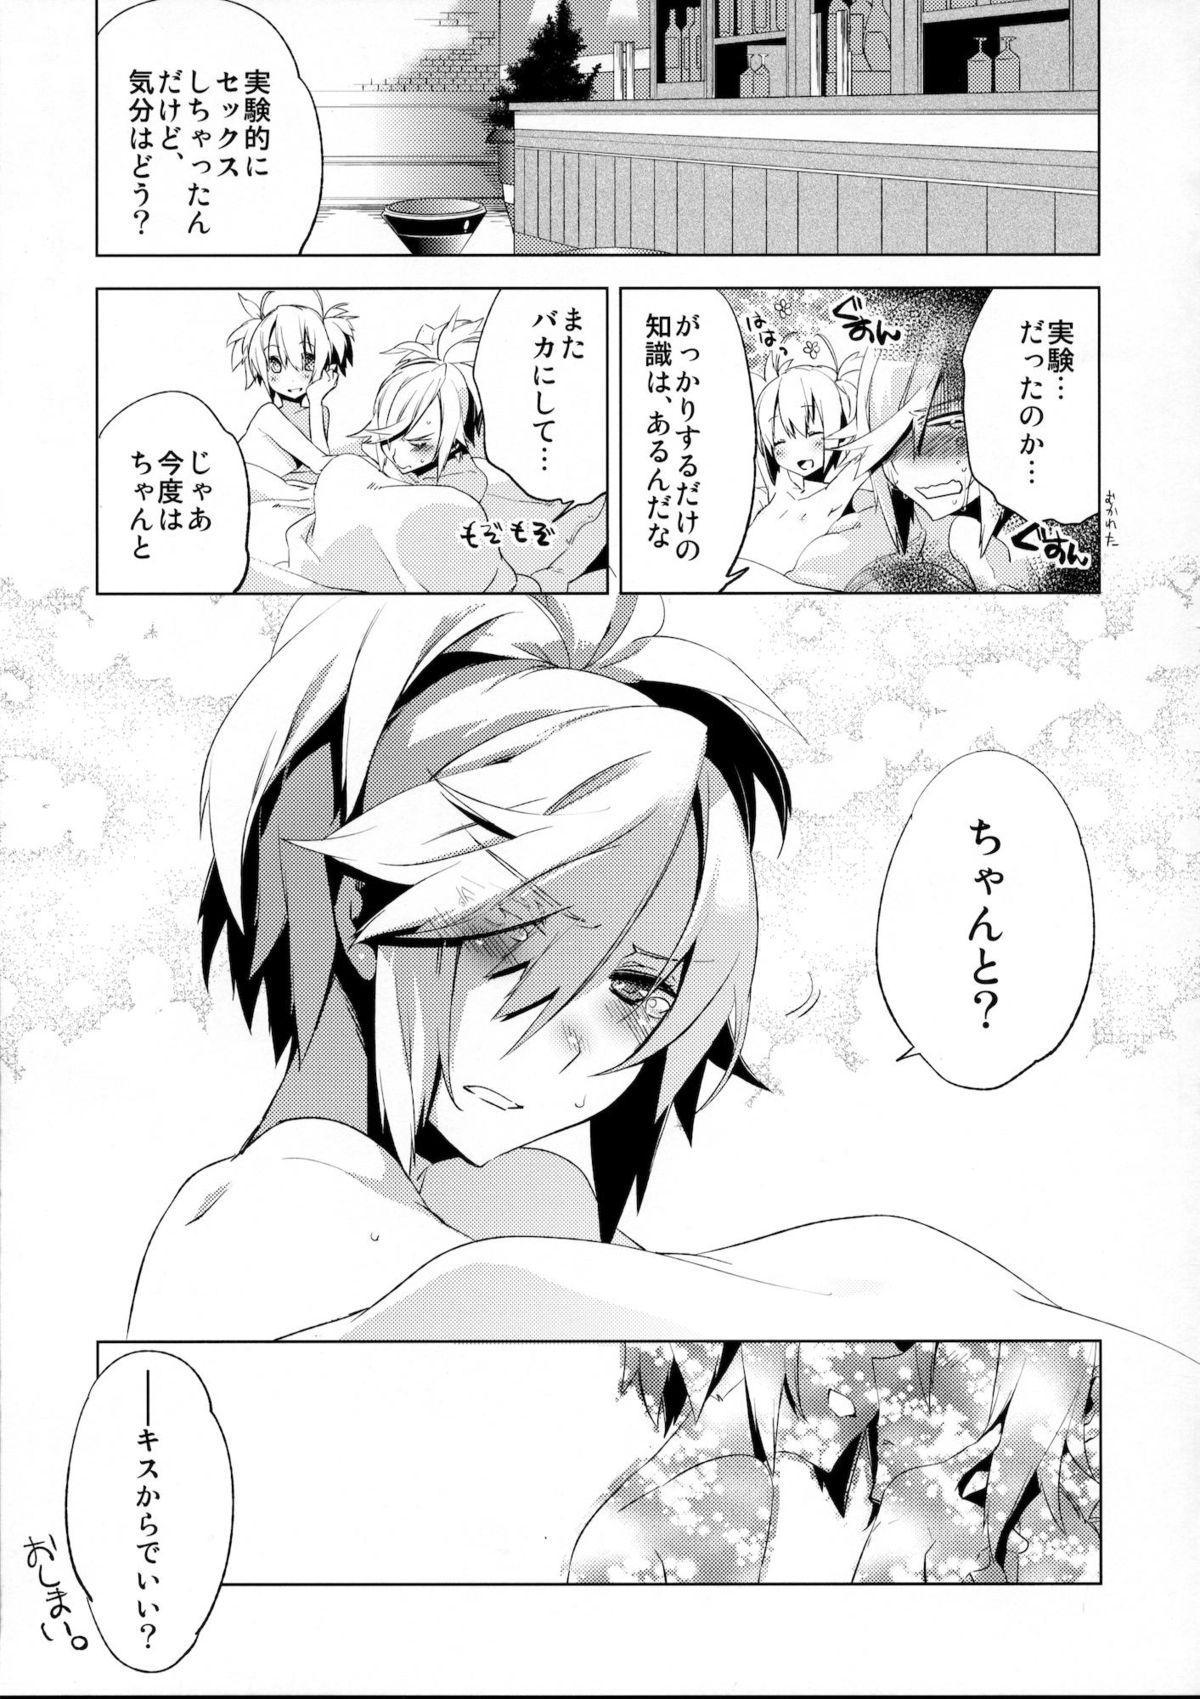 Korizu ni Josou Shounen Hon 6 Sizzle Infinity! 15